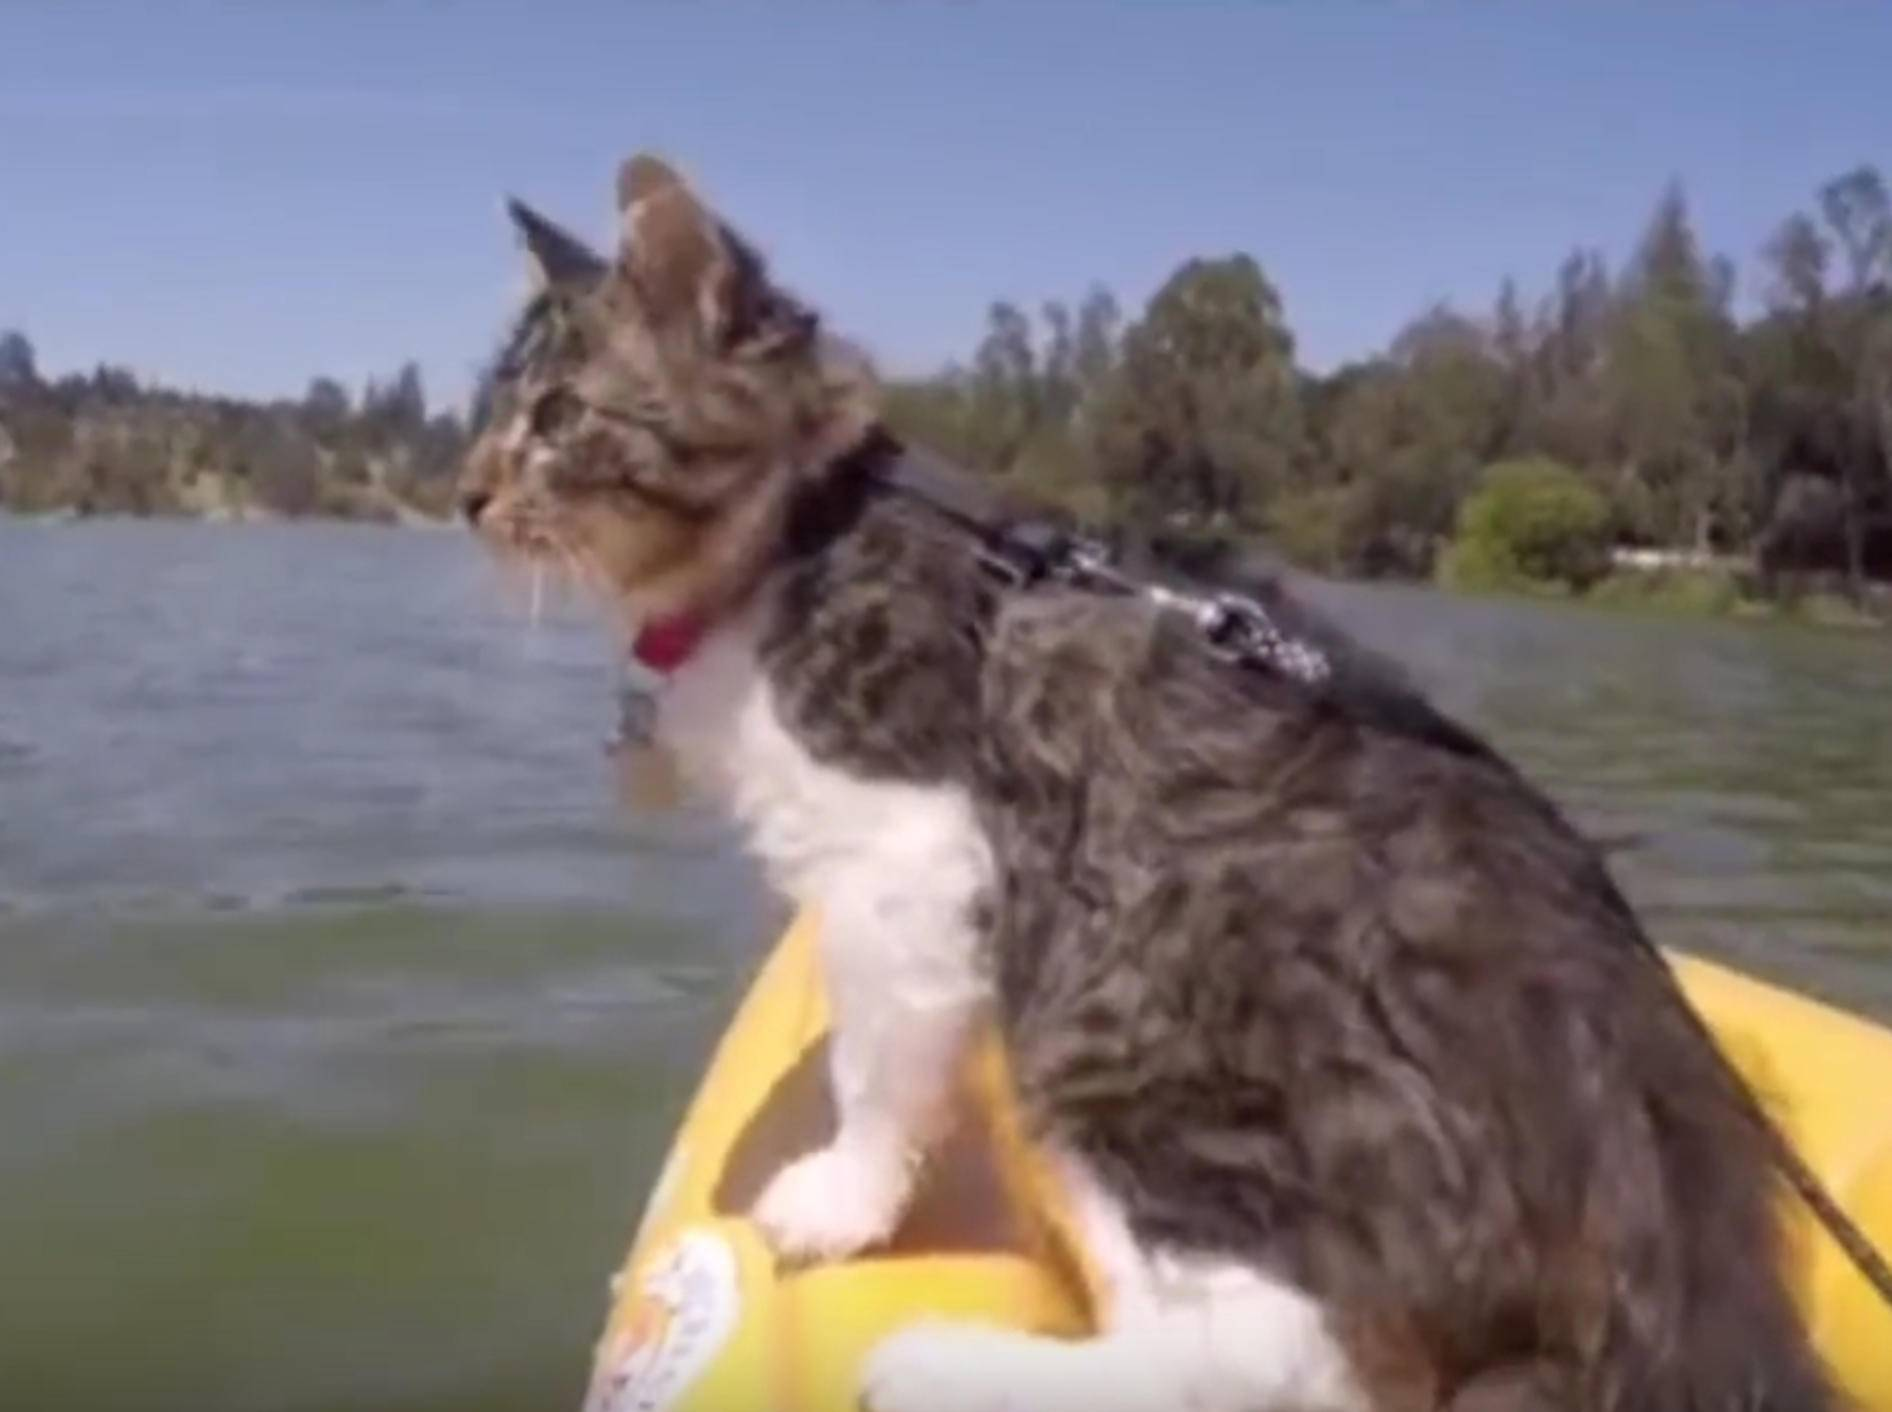 Katze Rosie auf Kajak-Tour – Bild: YouTube / Lilothehusky